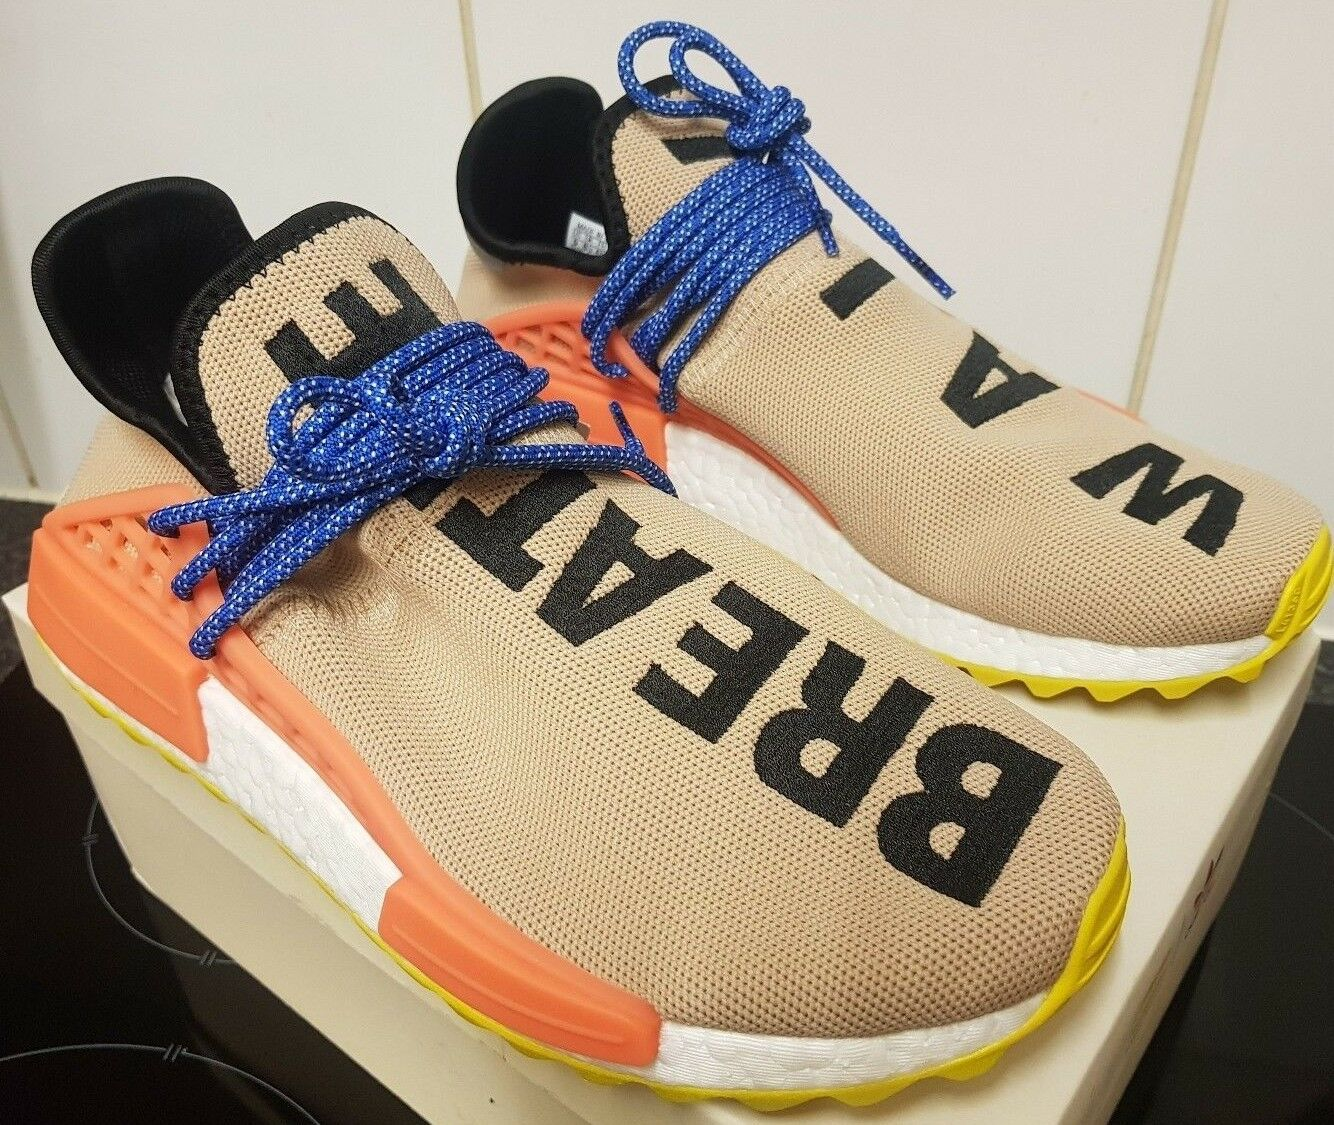 Adidas Pharrell Williams Williams Pharrell Razza Umana Hu Nmd Tracce Pallido Nudi 10 f2249f